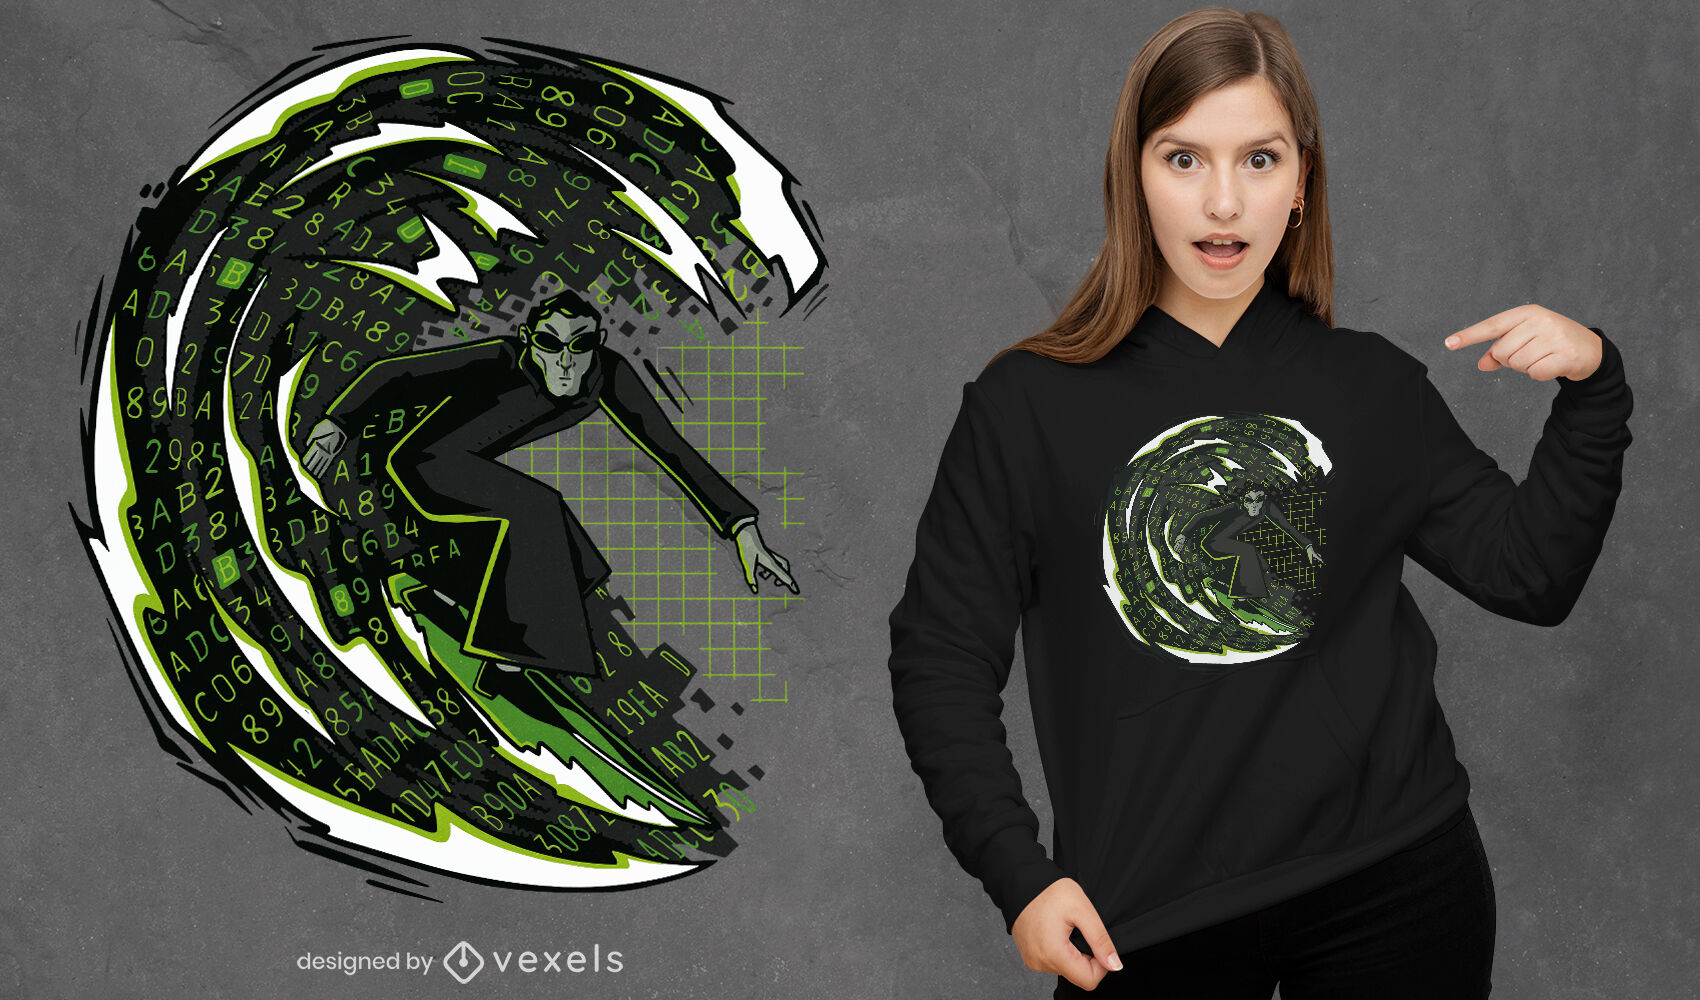 Cyberspace surfing man t-shirt design